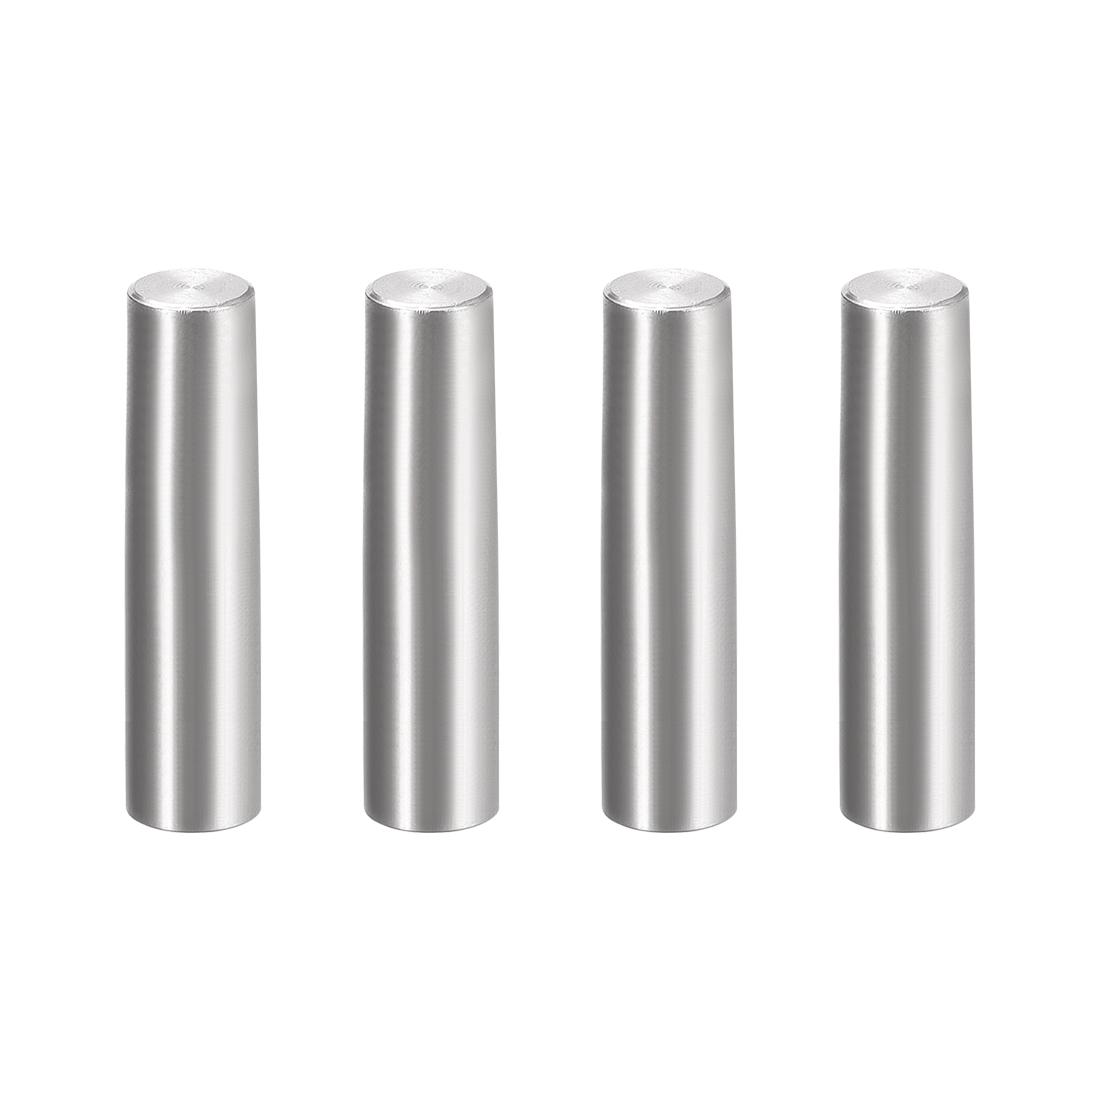 4Pcs 8mm x 35mm 1:50 Taper Pin 304 Stainless Steel Shelf Support Pin Fasten